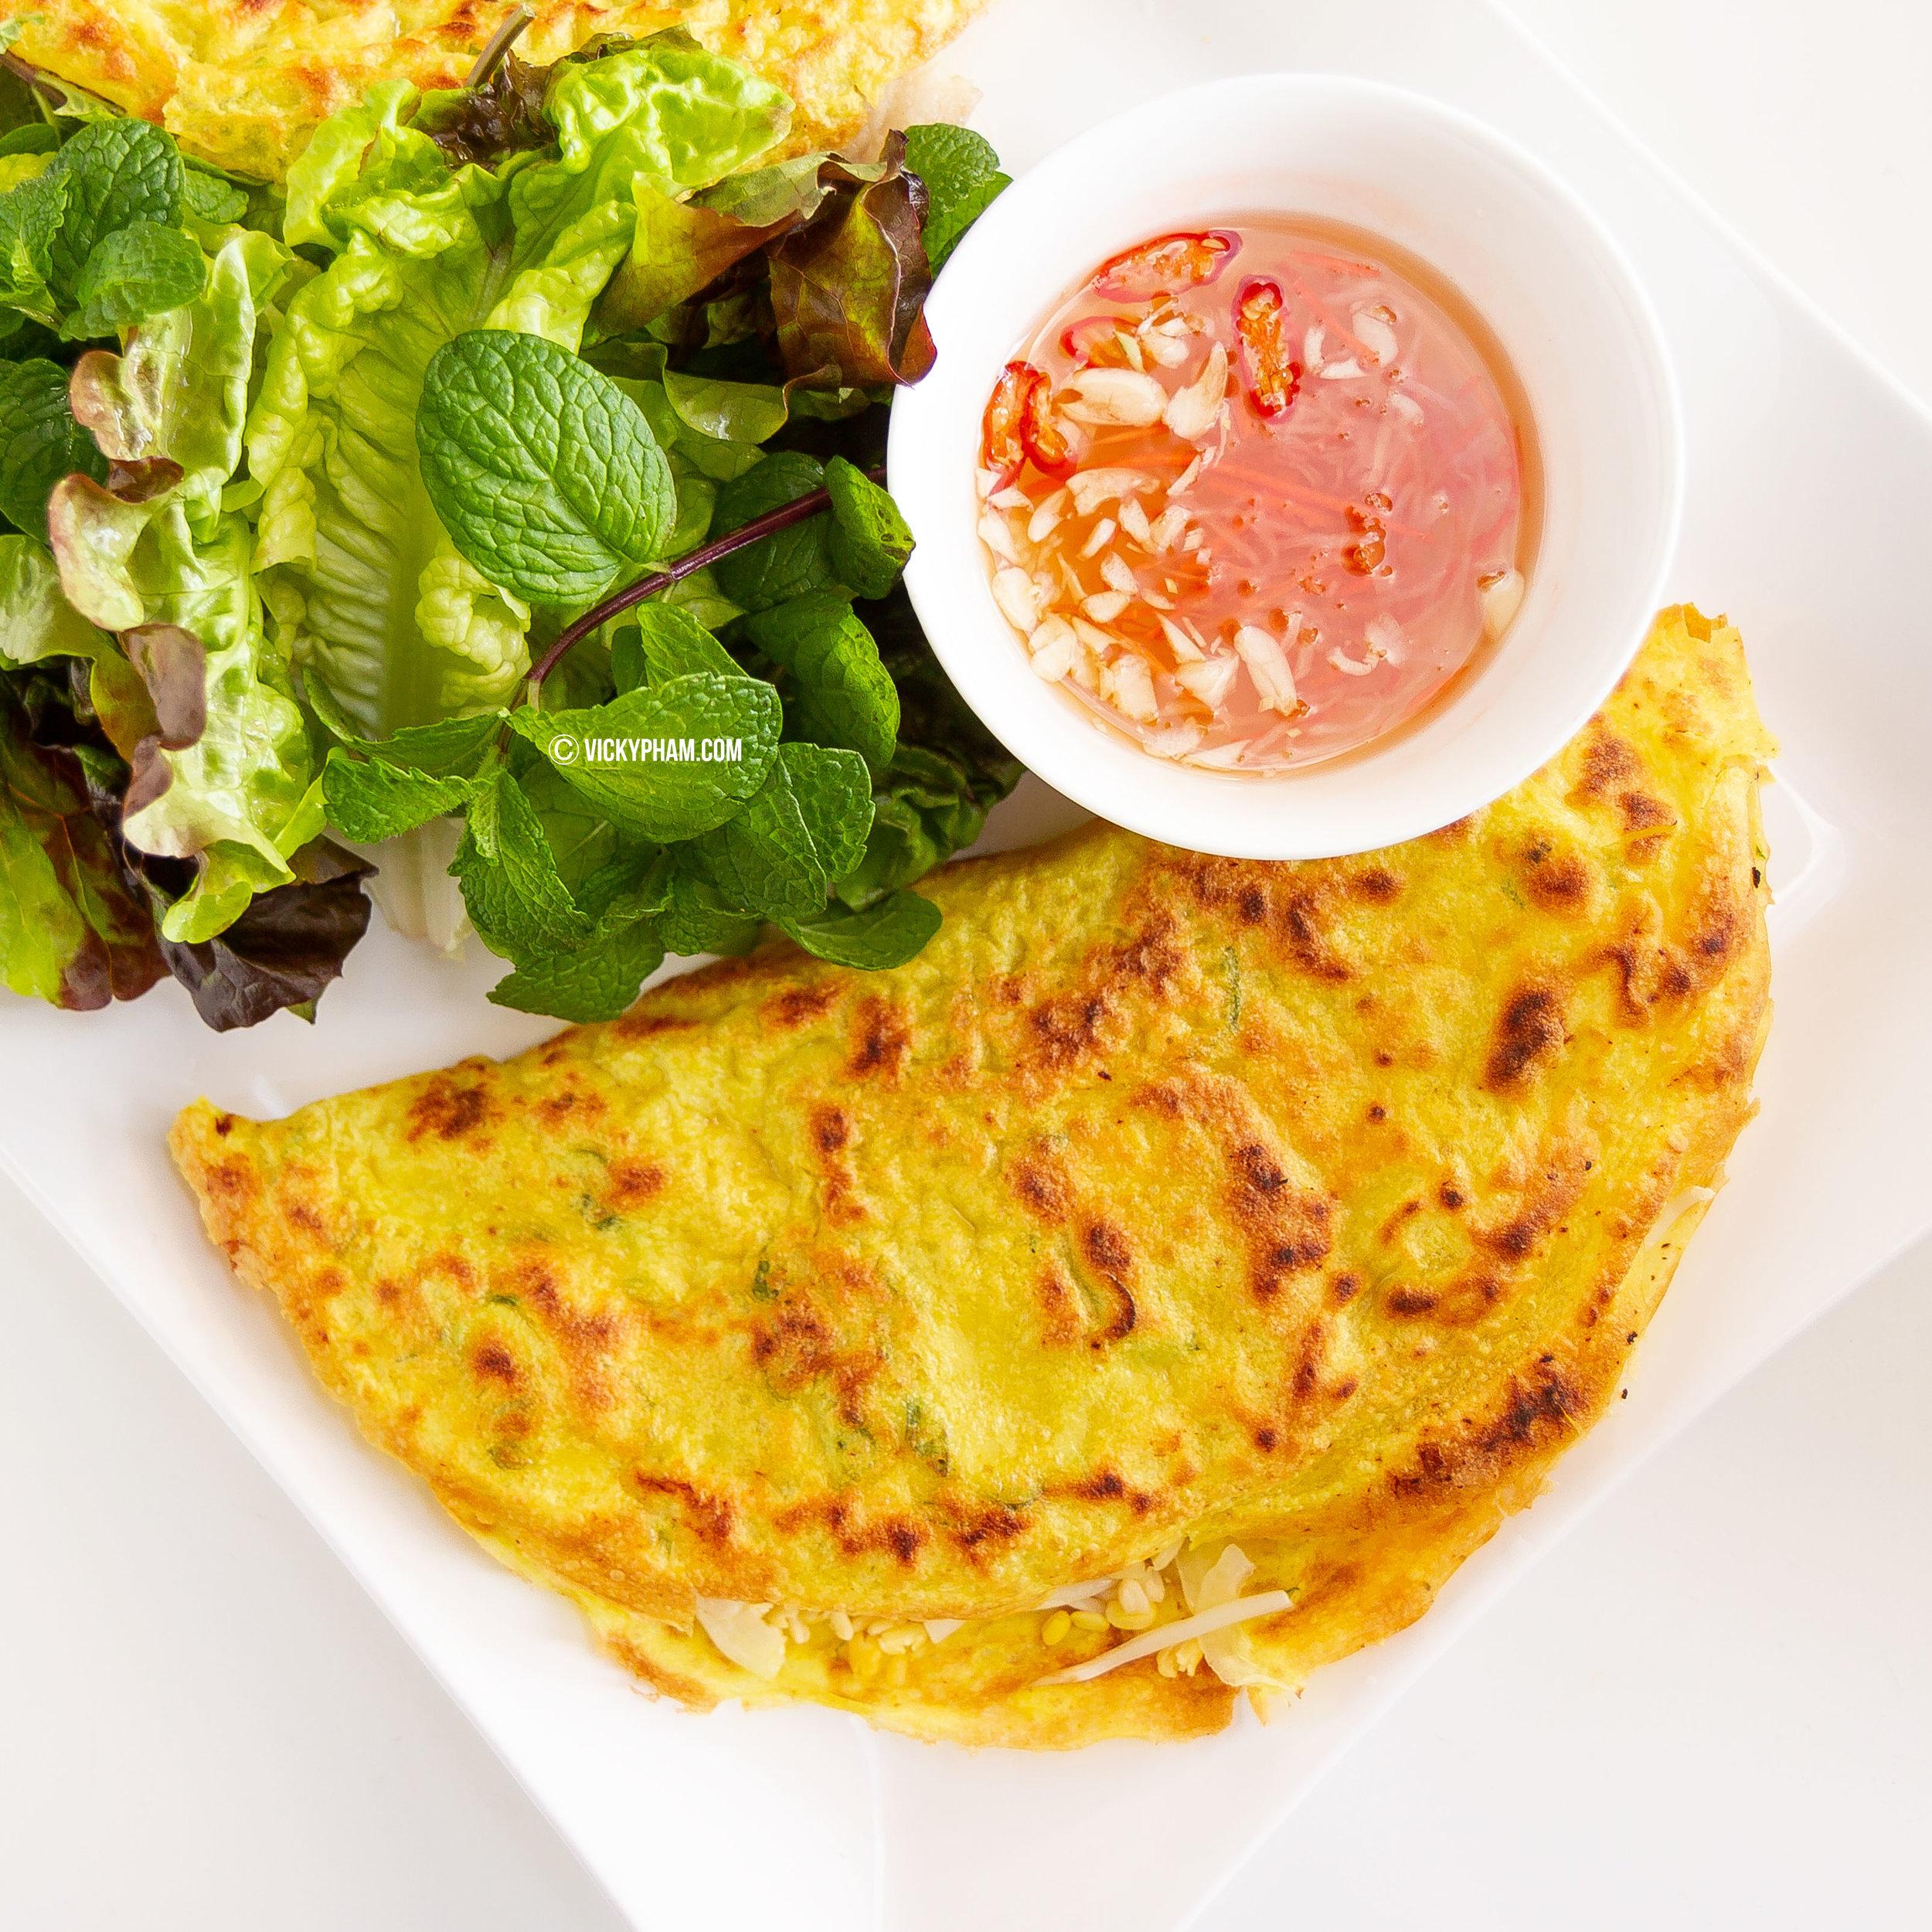 Vietnamese Sizzling Crepe Pancake Banh Xeo Vietnamese Home Cooking Recipes